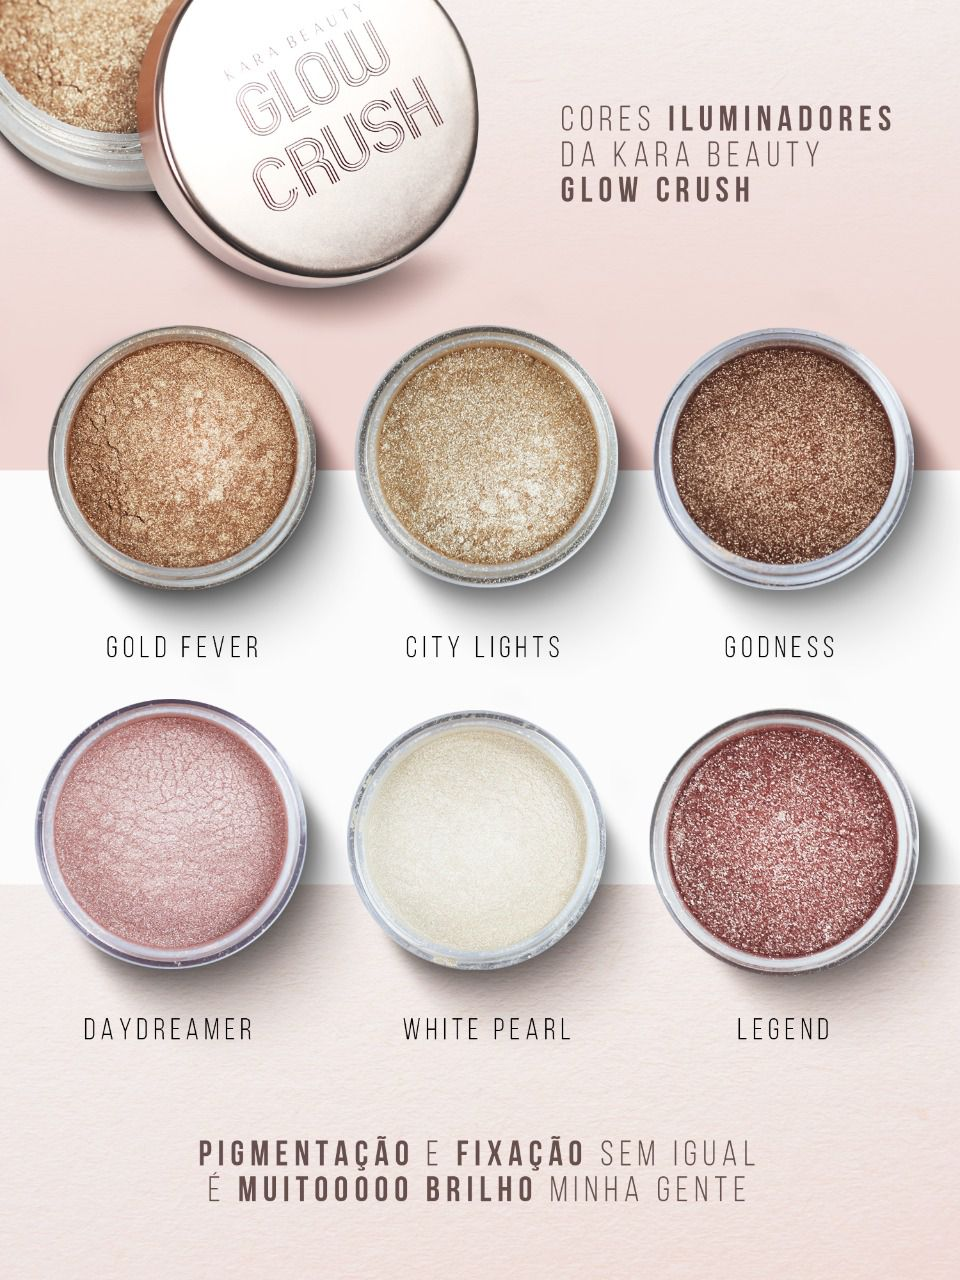 Iluminador Glow Crush | Kara Beauty